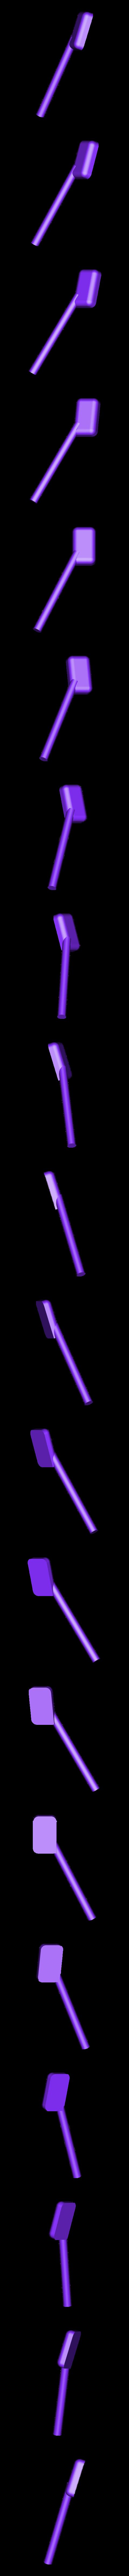 ducati spiegel-right.stl Download free STL file ducati monster 696 • Object to 3D print, jasperbaudoin